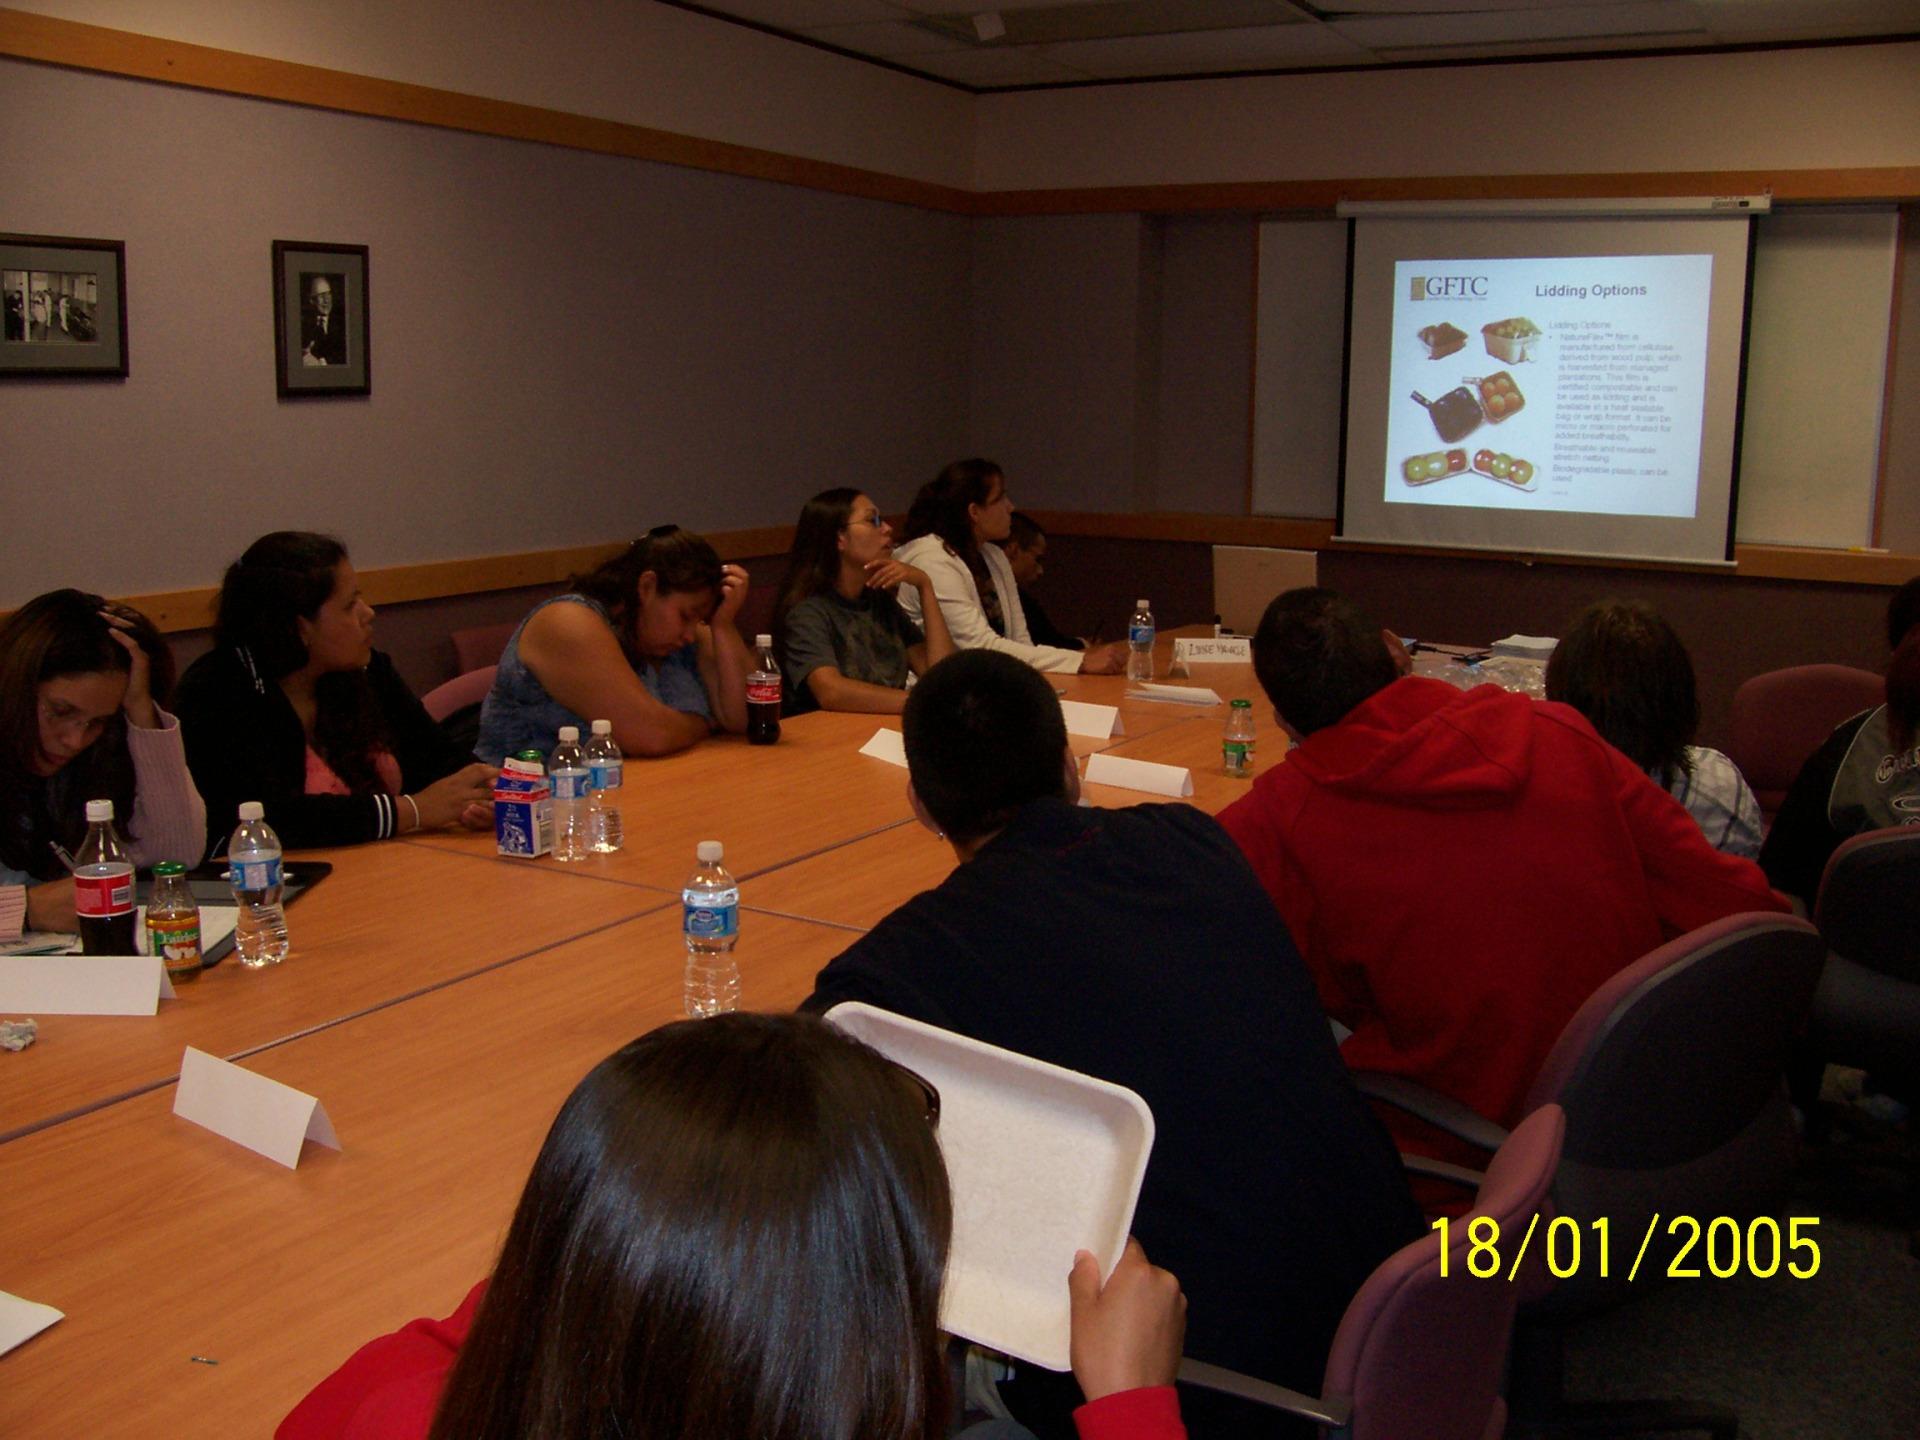 Guelph Food Technology Centre Workshop presentation picture